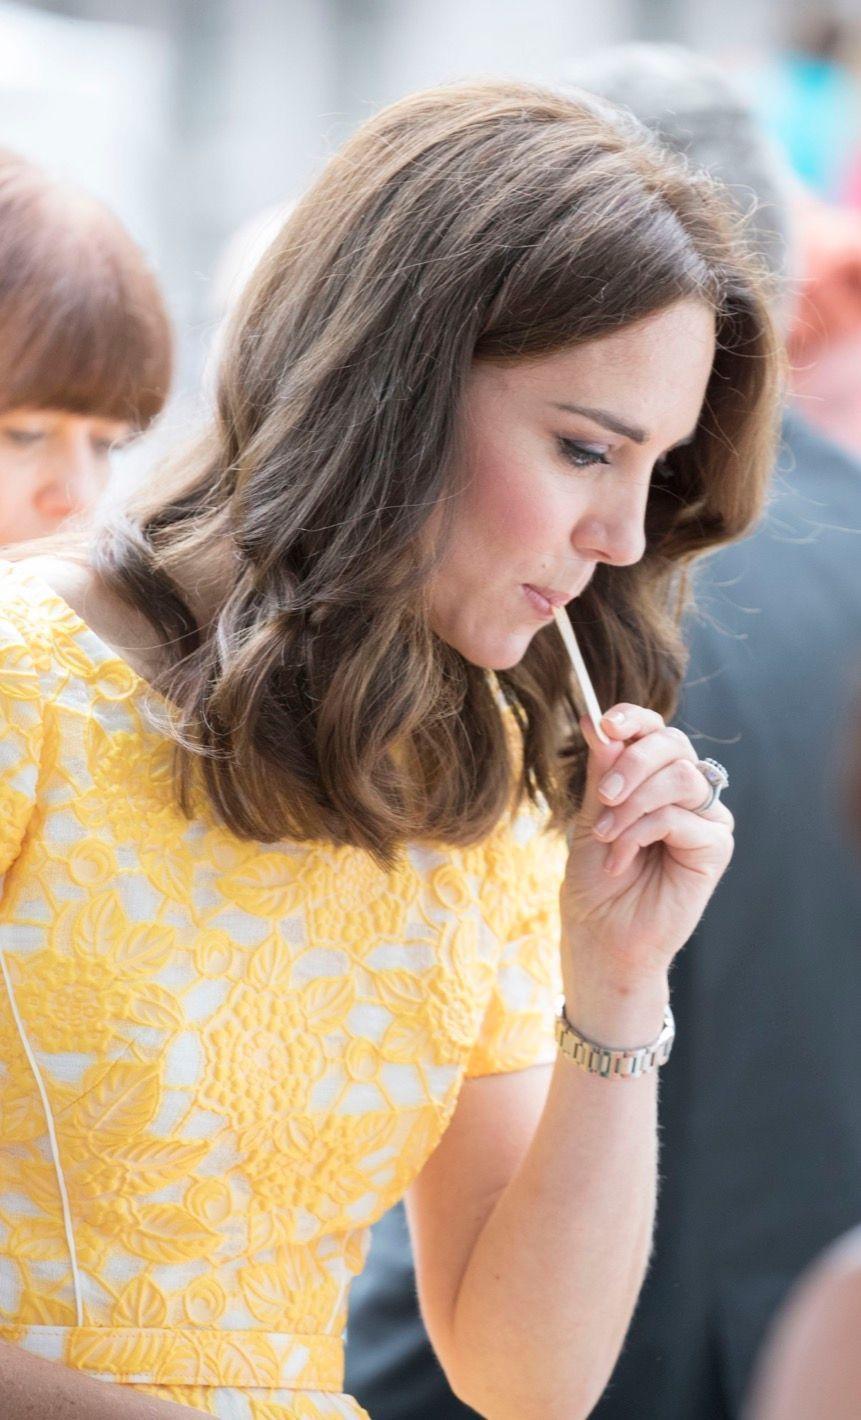 Kate Middleton Et Le Prince William En Visite Au Marché Central De Heidelberg, En Allemagne 26